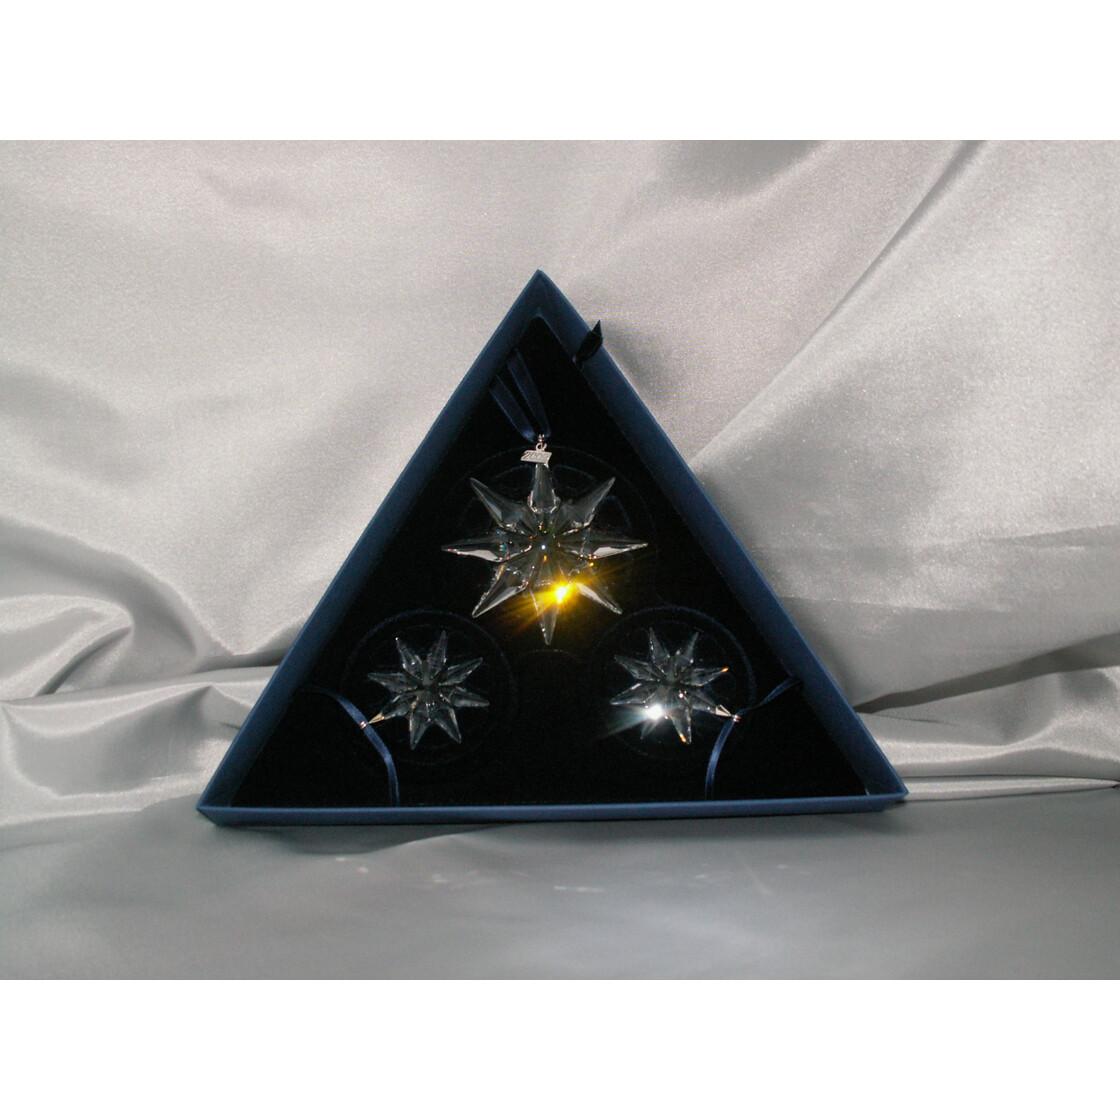 Swarovski Sterne-Set 2009 Christmas-Ornament Set of 3 ...